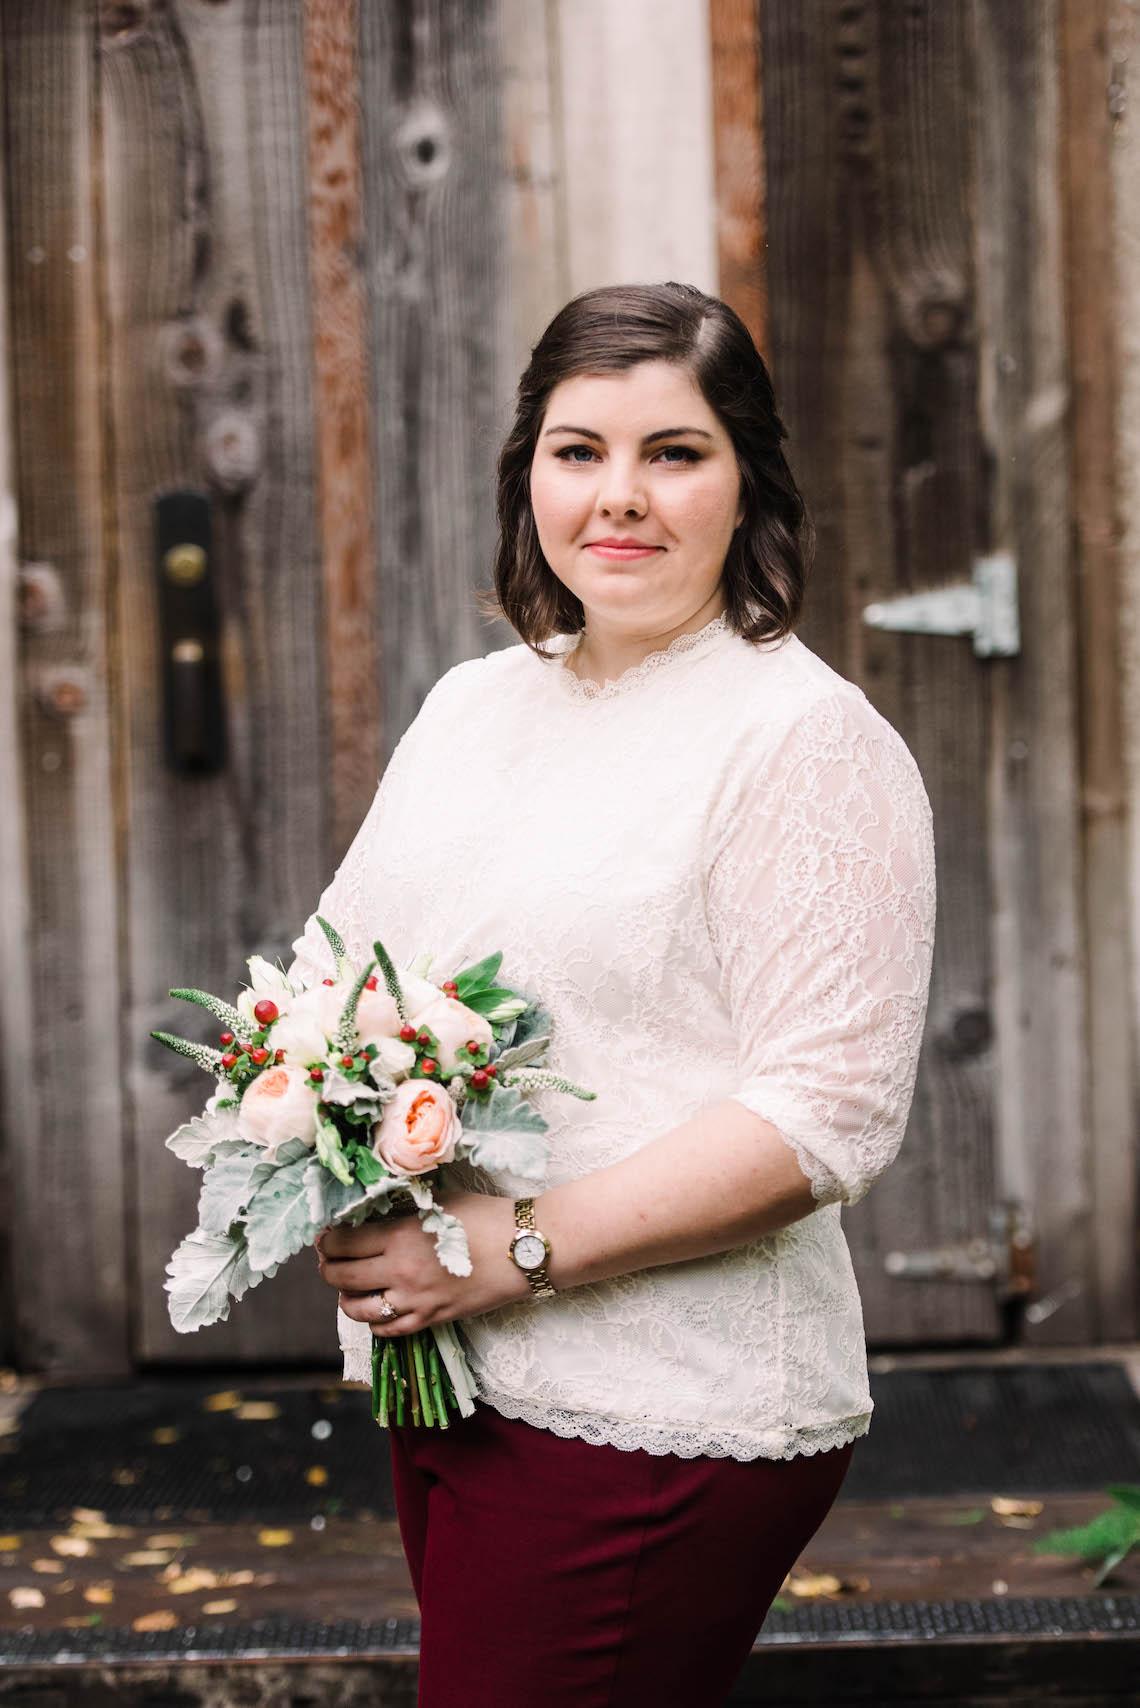 Rustic Barn Wedding Filled With Greenery | Deyla Huss Photography 40